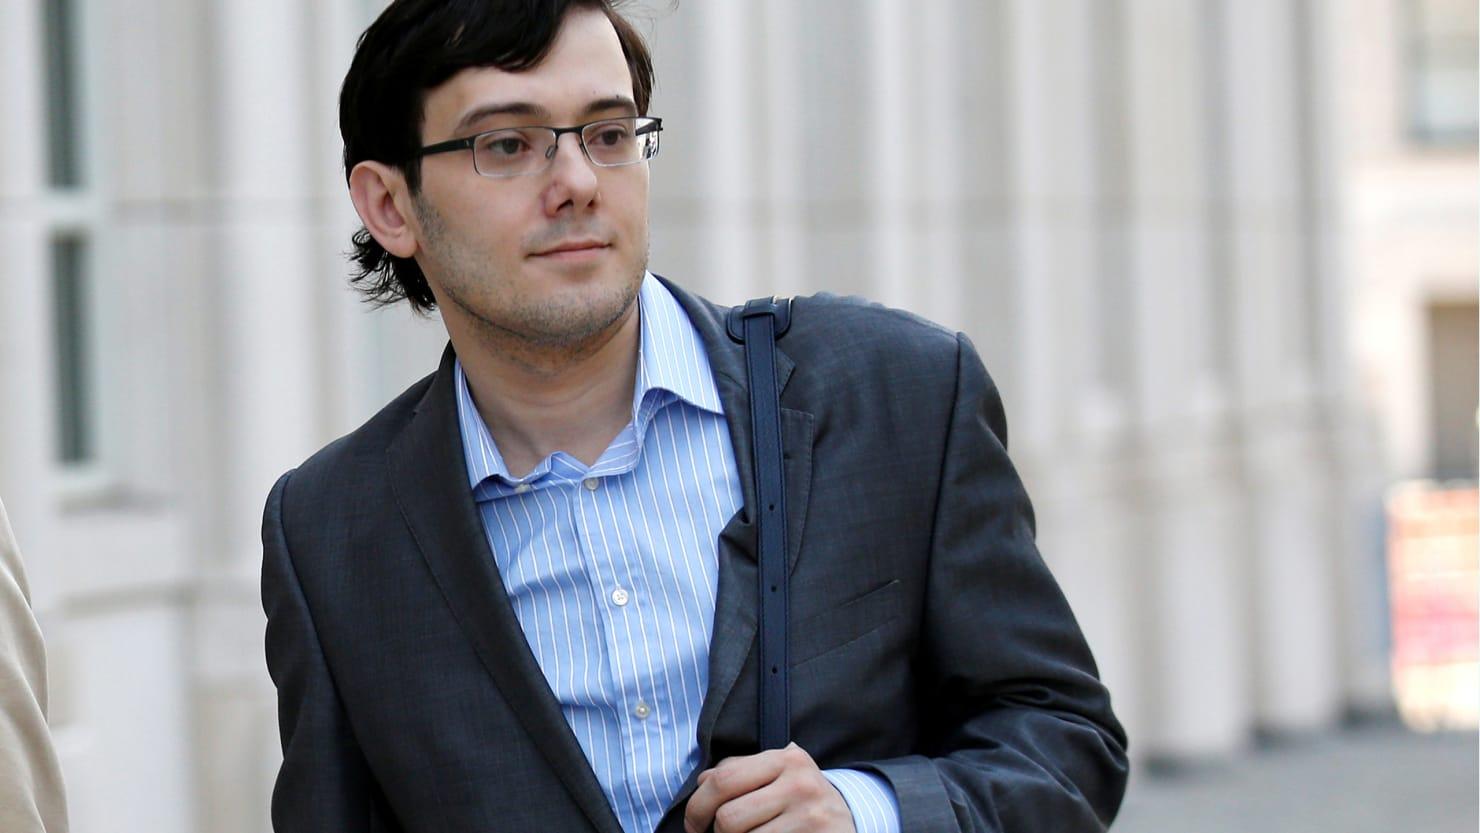 Martin Shkreli's Bail Revoked, Taken Into Custody